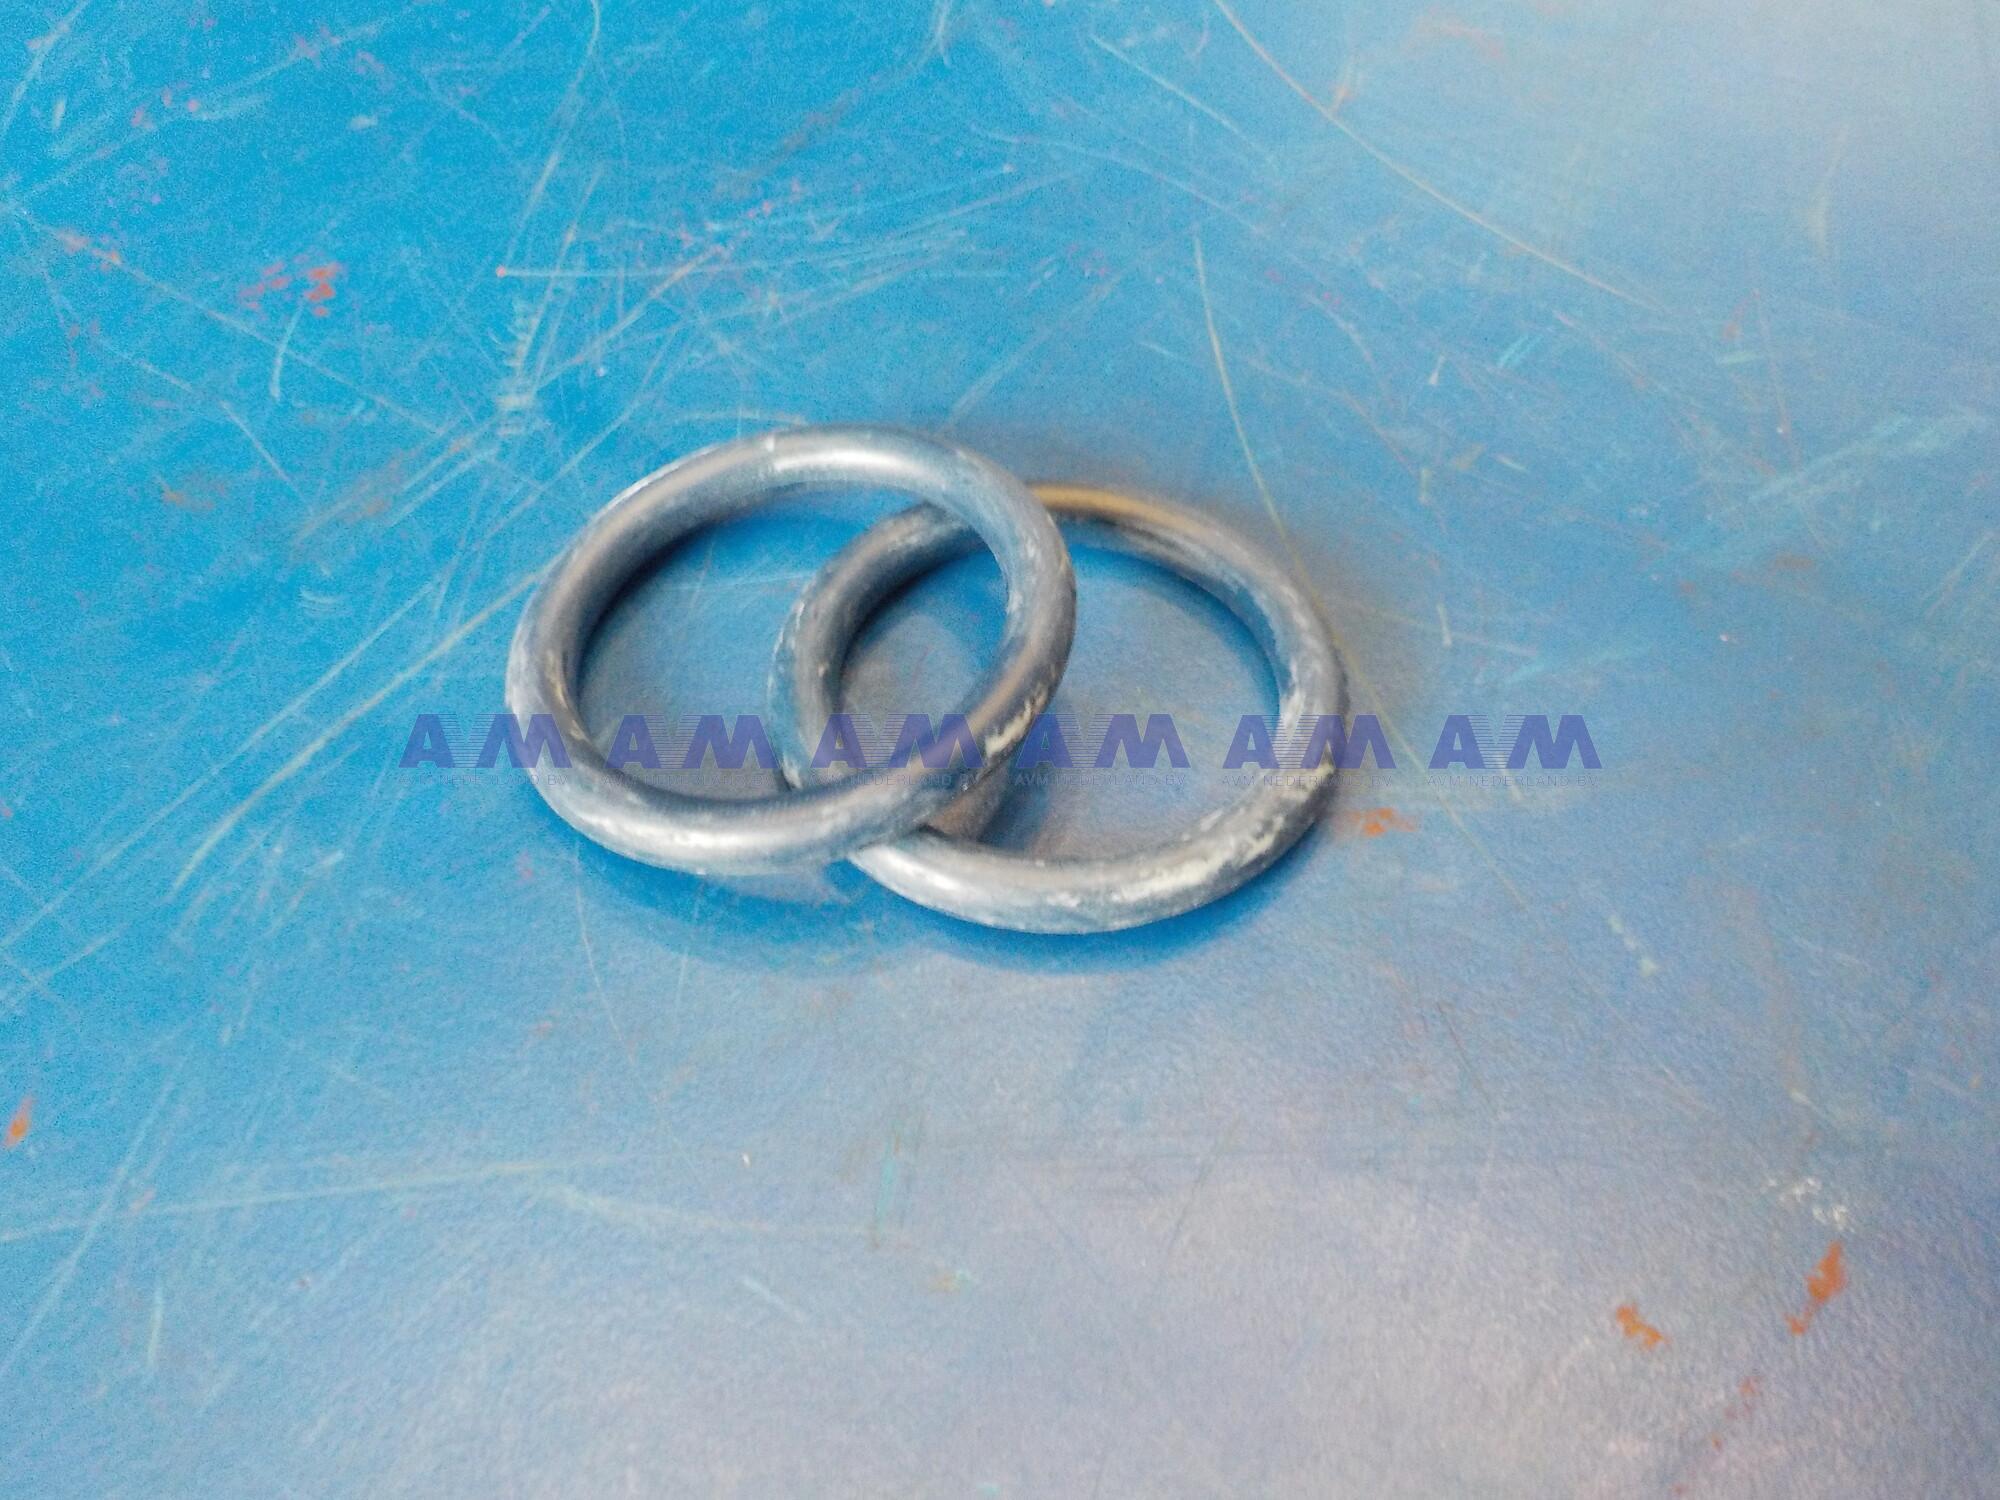 O-ring Viton O32x5HT-NBR Kessler